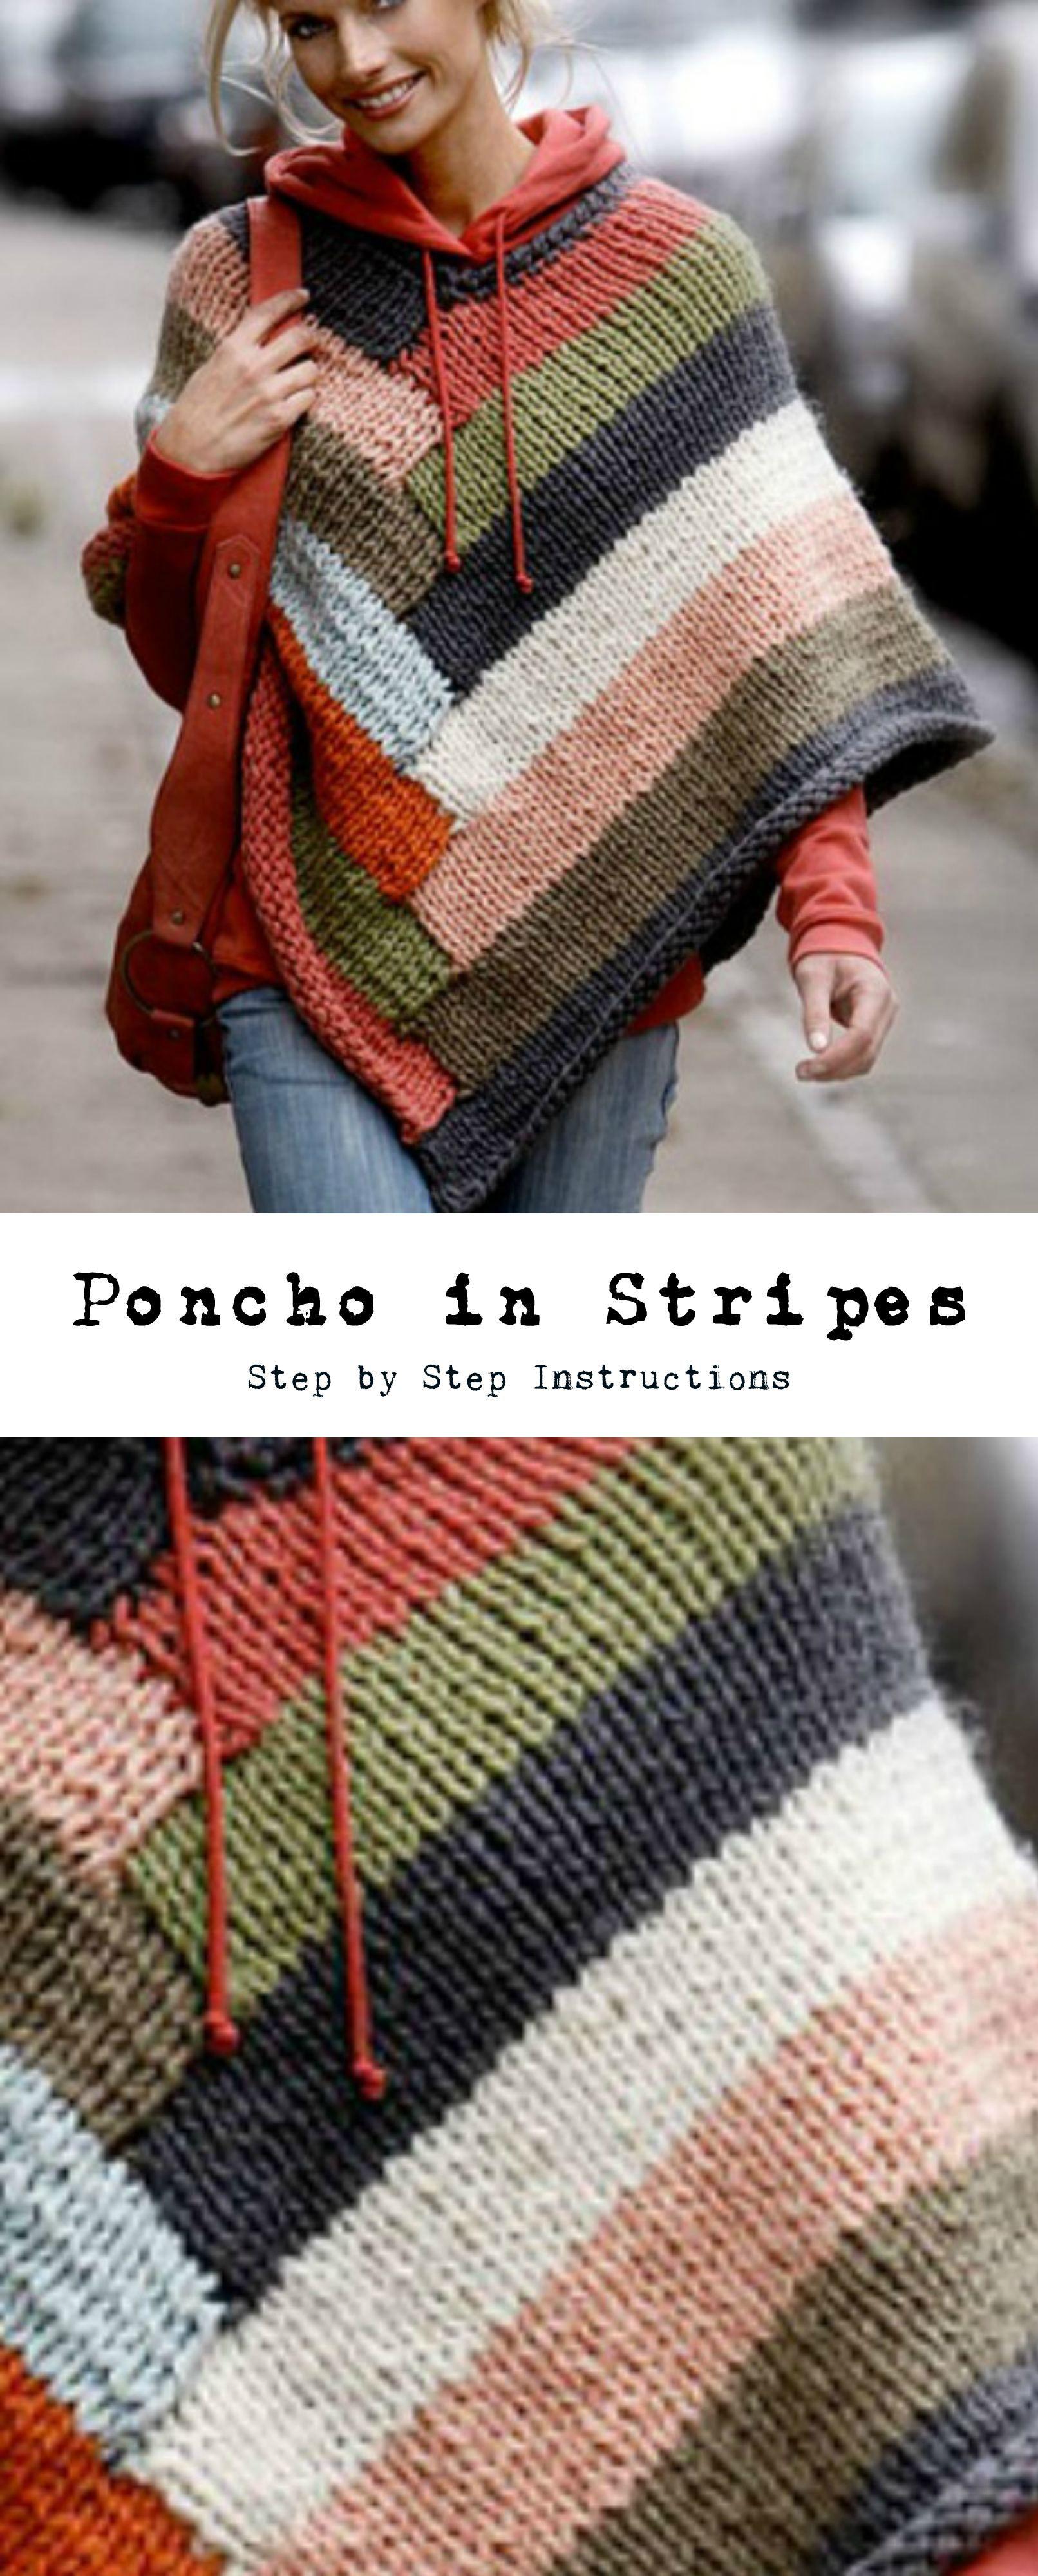 Poncho In Stripes   PUNTO   Pinterest   Ponchos, Tejido y Chal